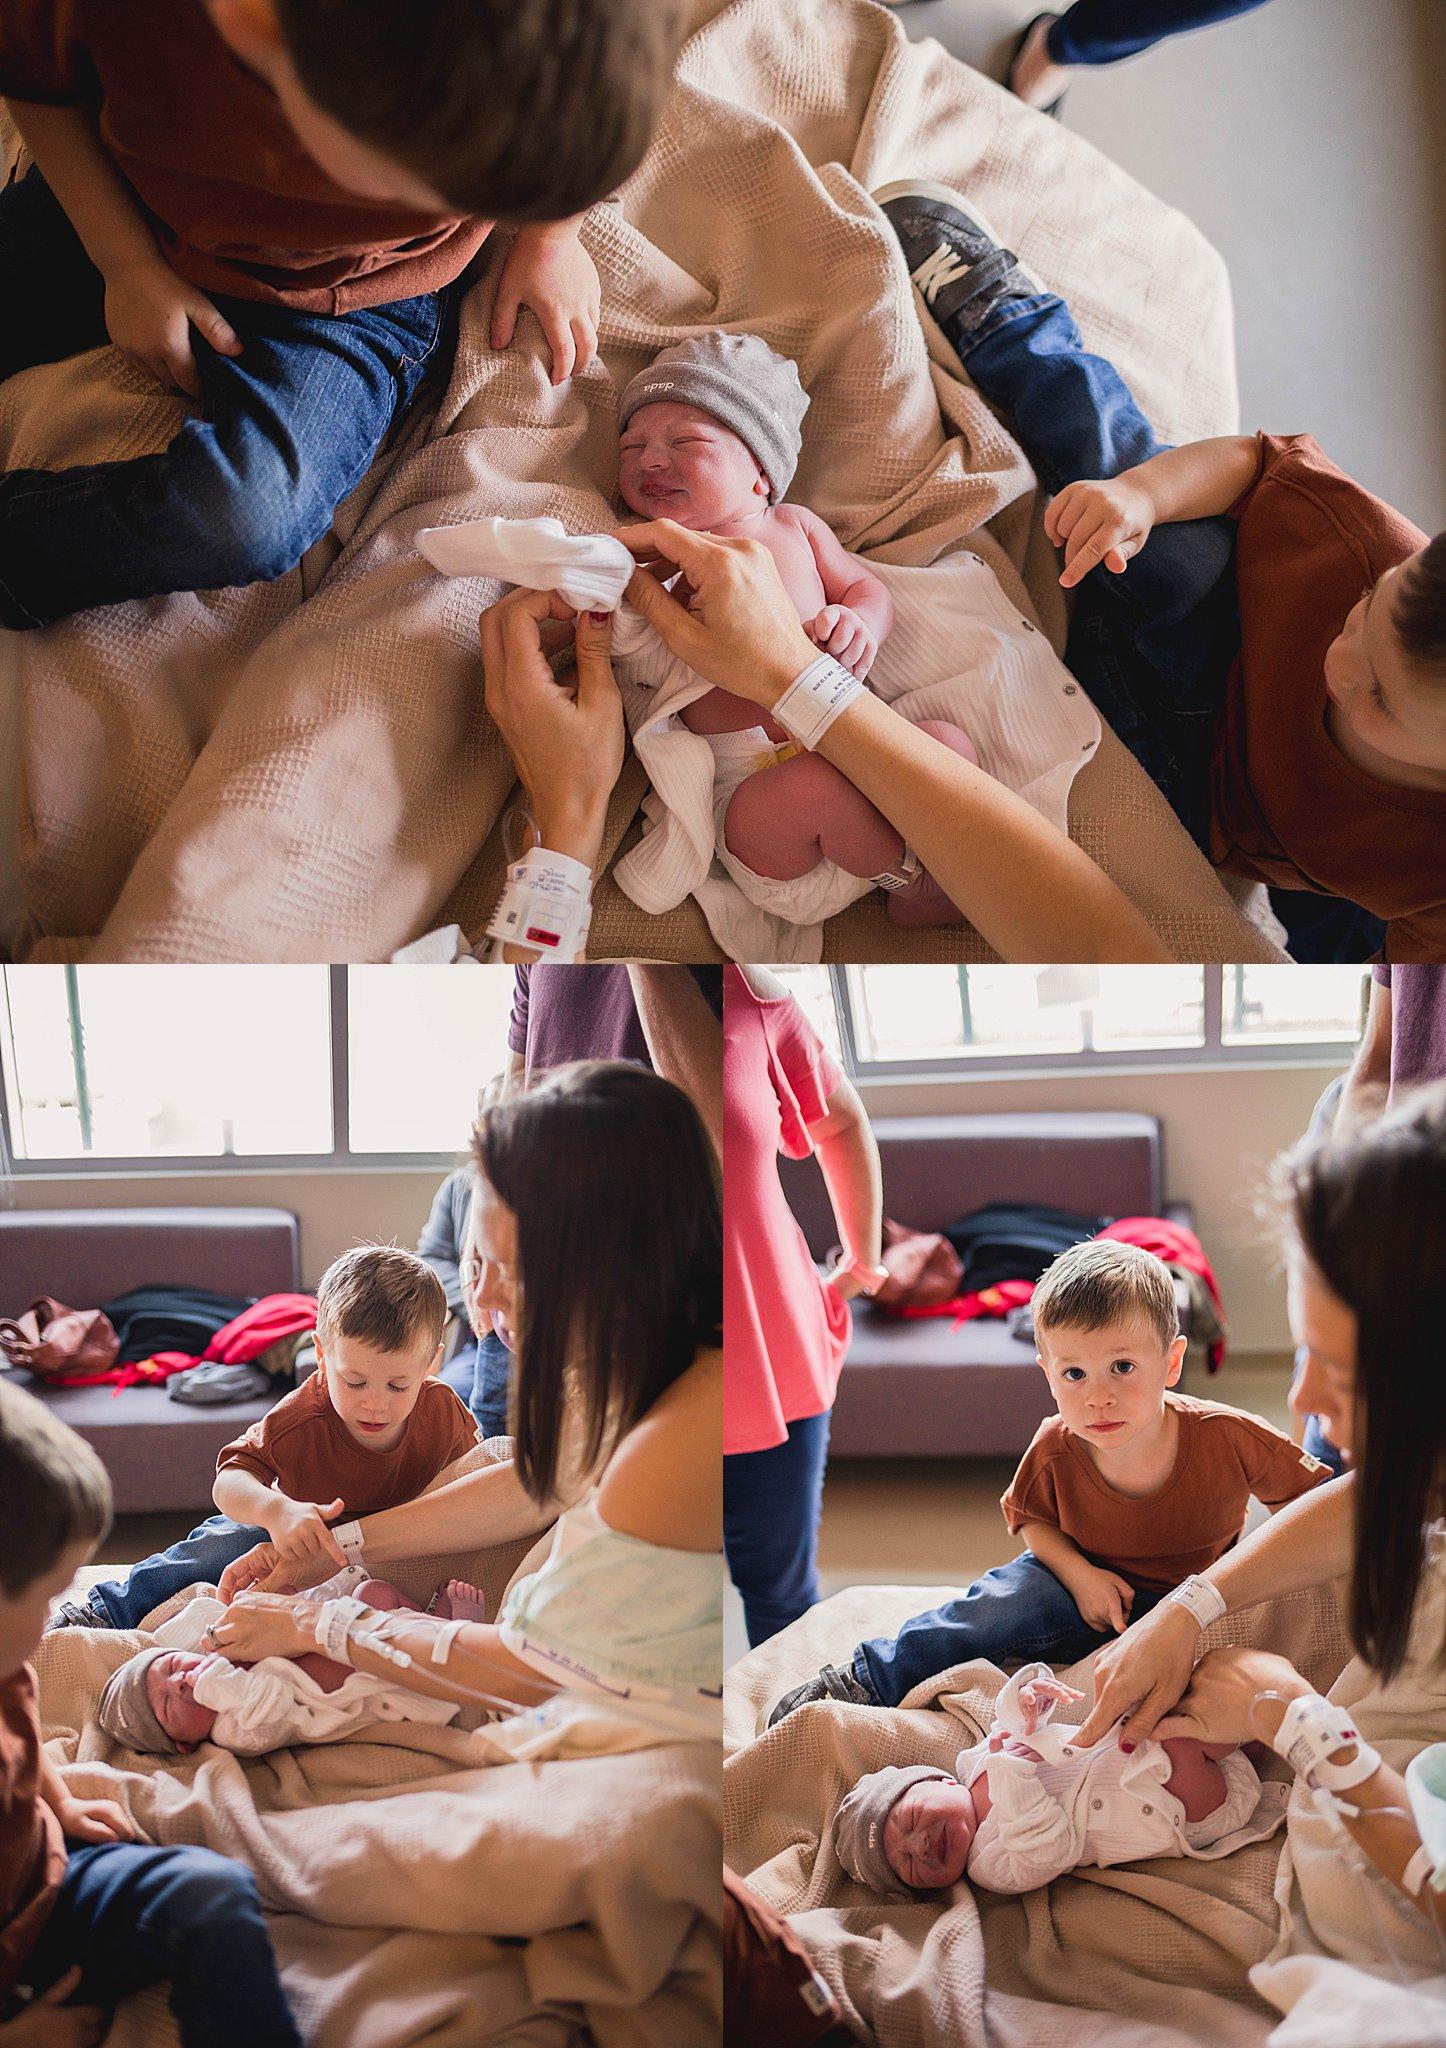 2019-03-16-hospital-baby-birth-photo-osage-beach-missouri-lake-2.jpg